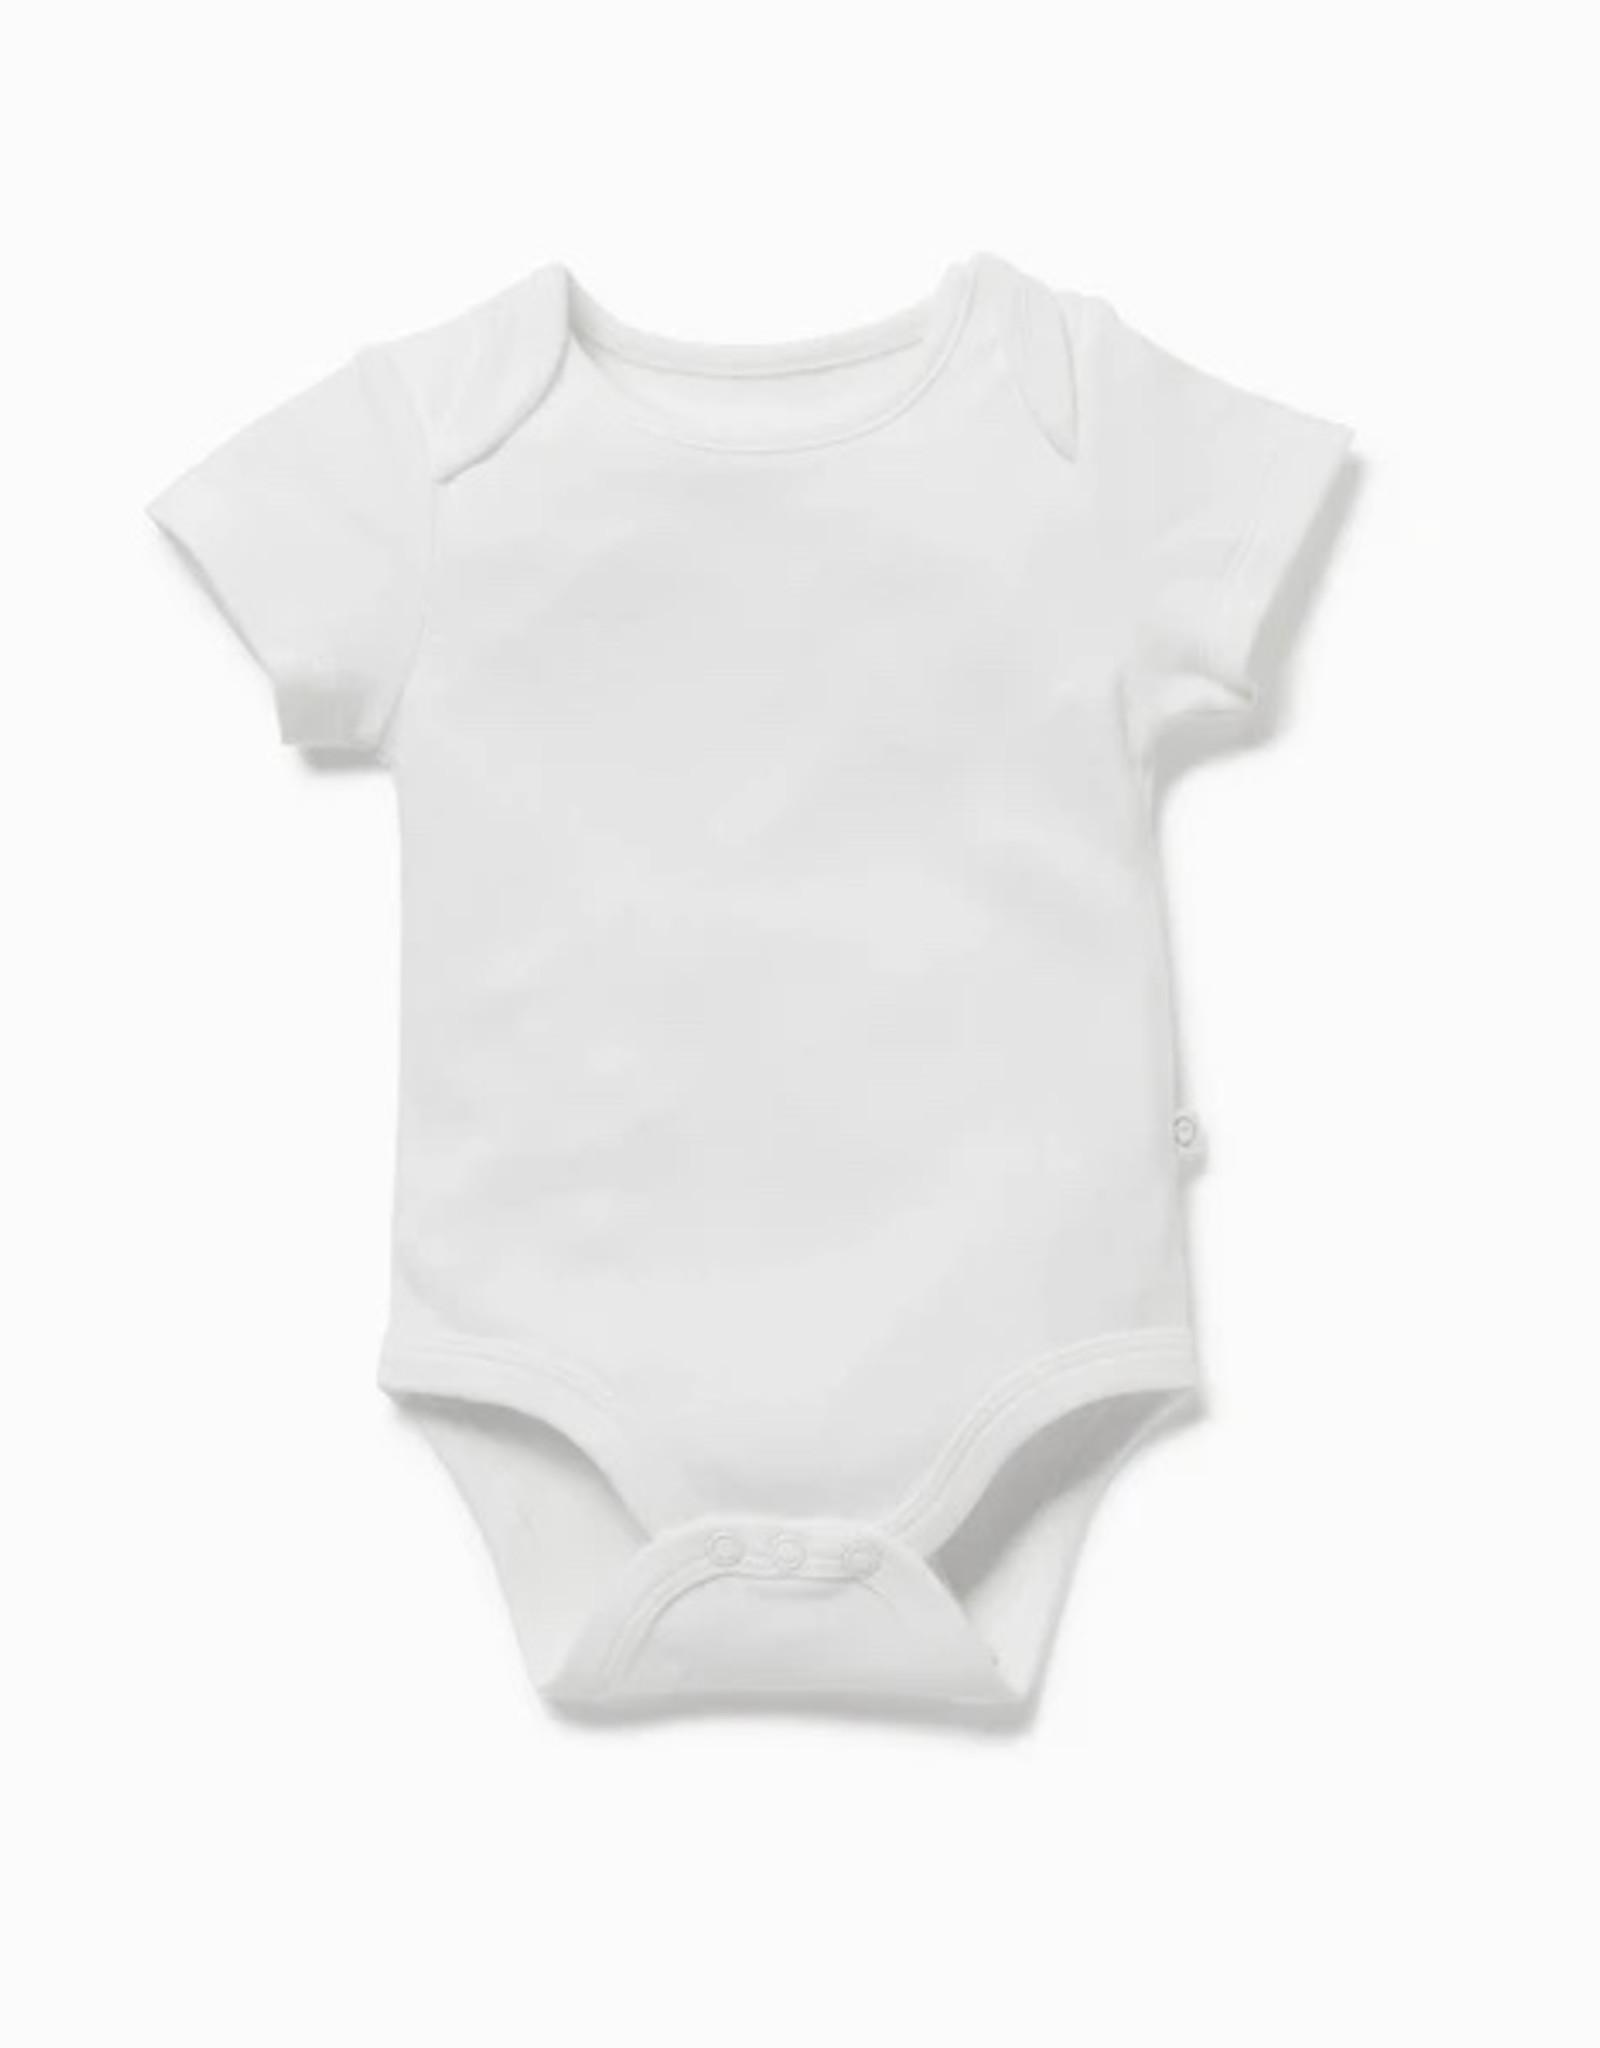 Baby Mori Short Sleeve Body Suit